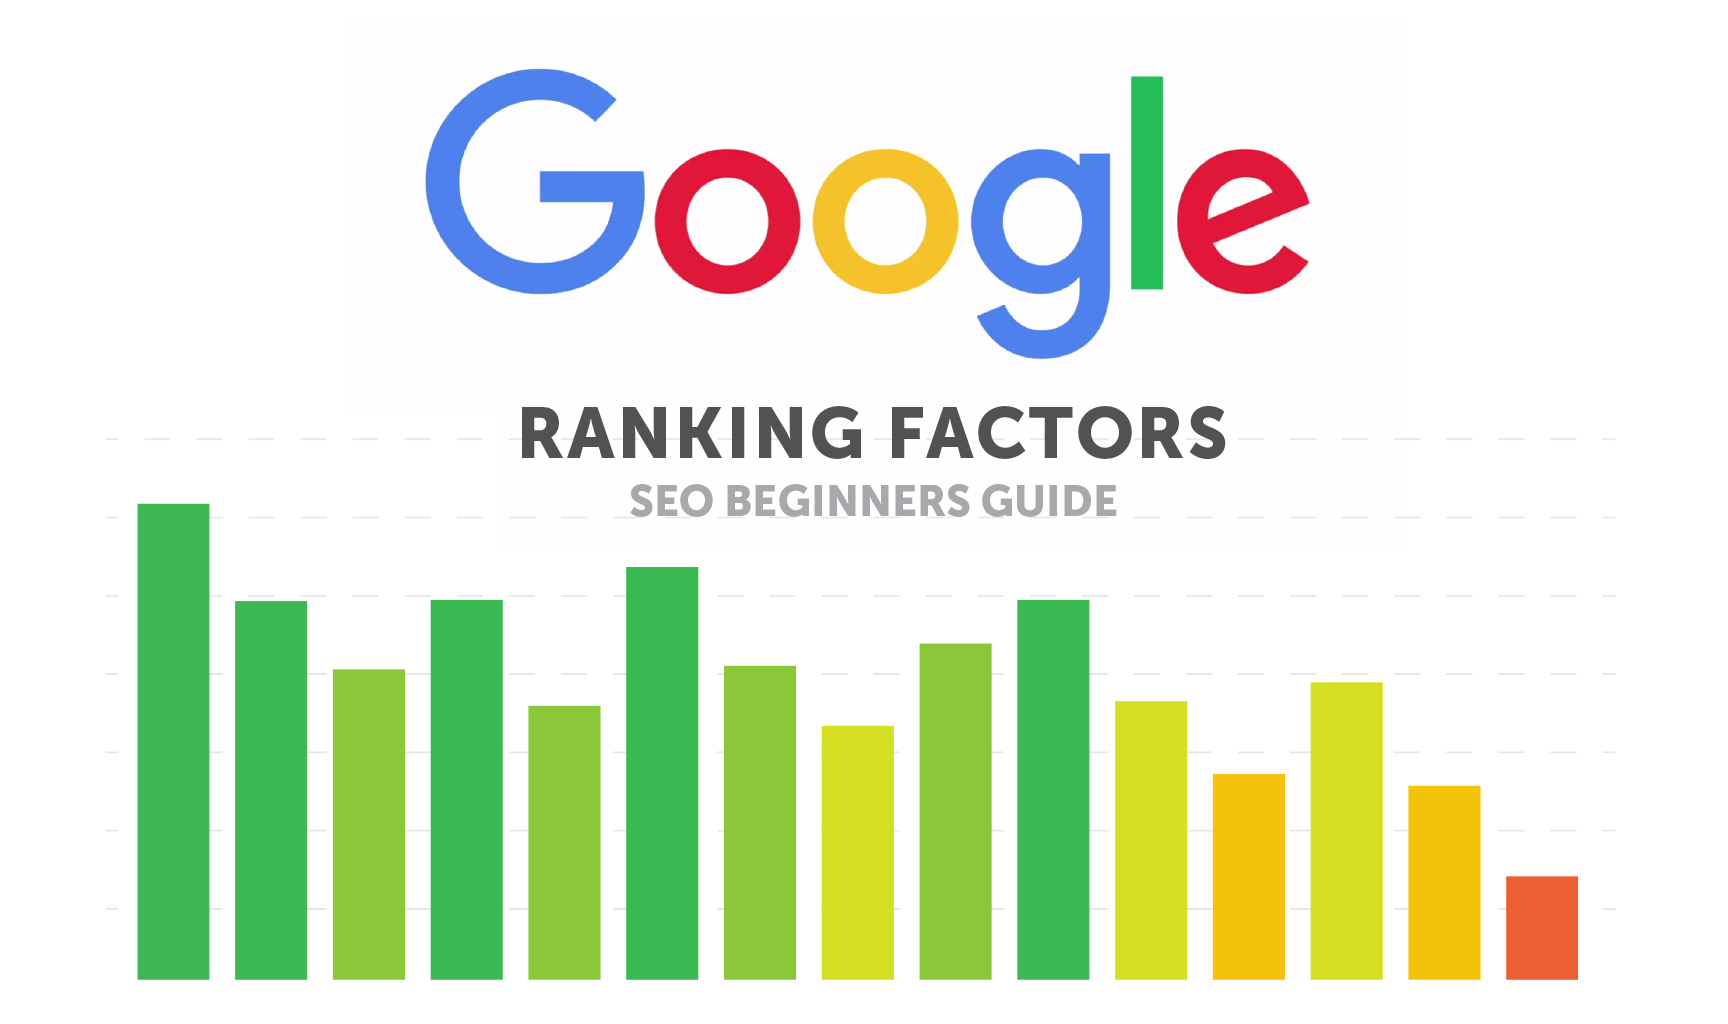 Google Ranking Factors: An SEO Beginners Guide